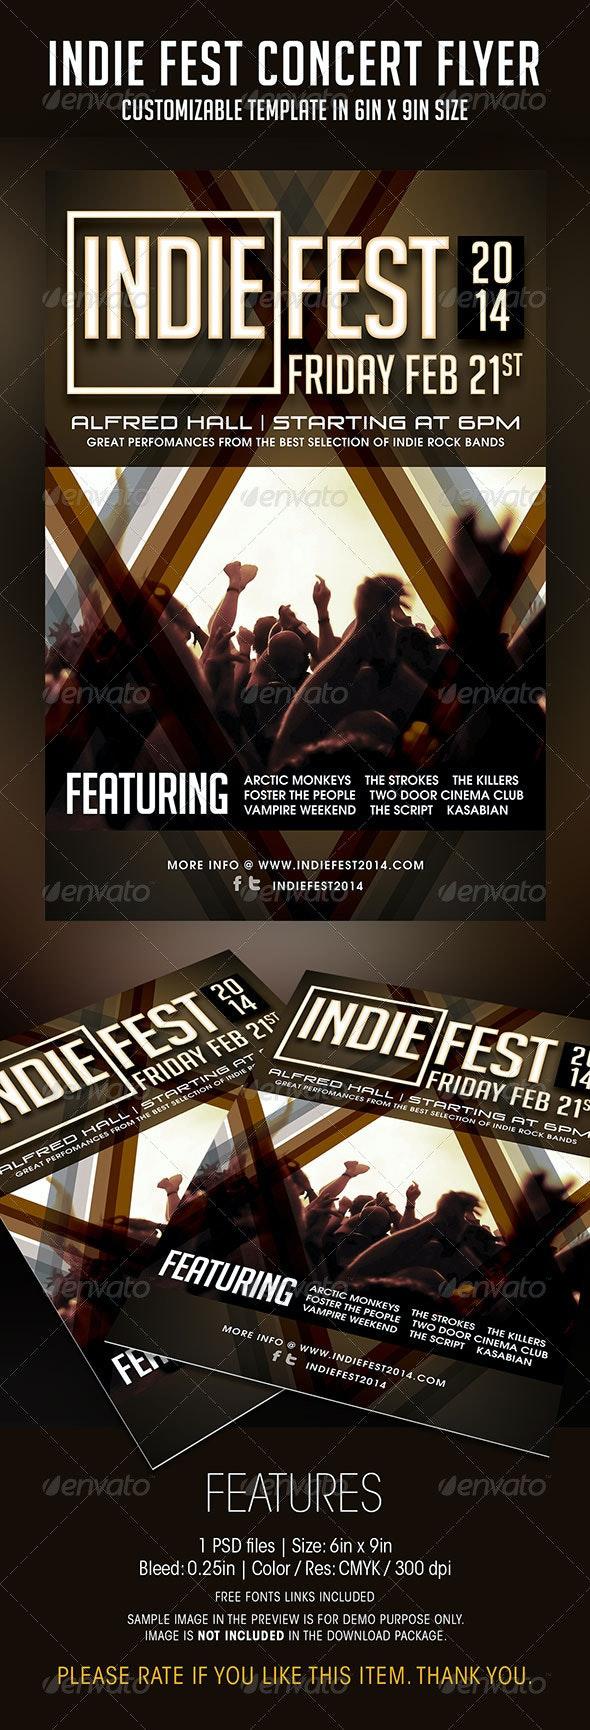 Indie Fest Concert Flyer - Concerts Events